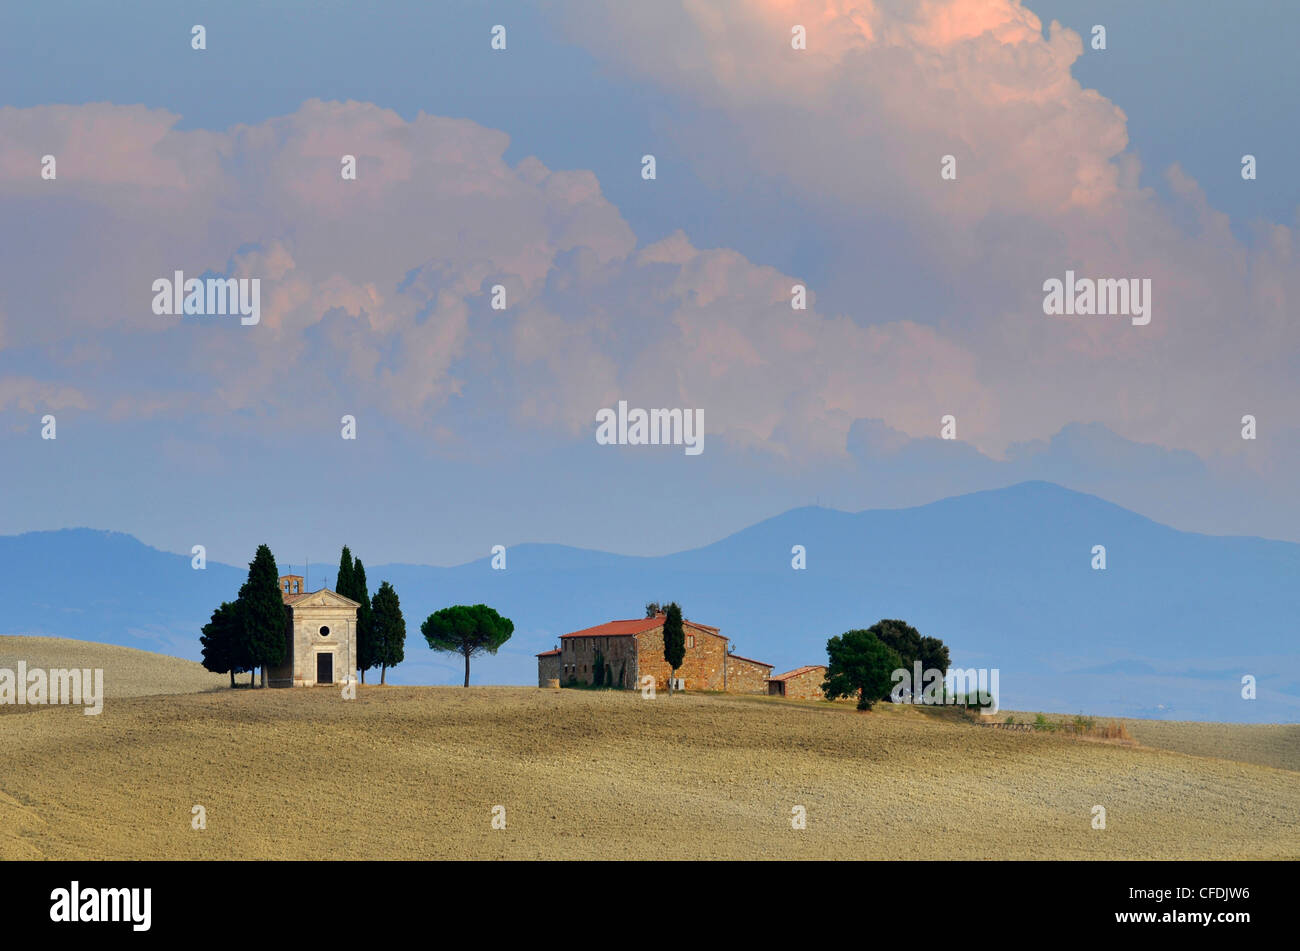 Kapelle in idyllischer Landschaft, San Quirico d ' Orcia, Toskana, Italien, Europa Stockbild